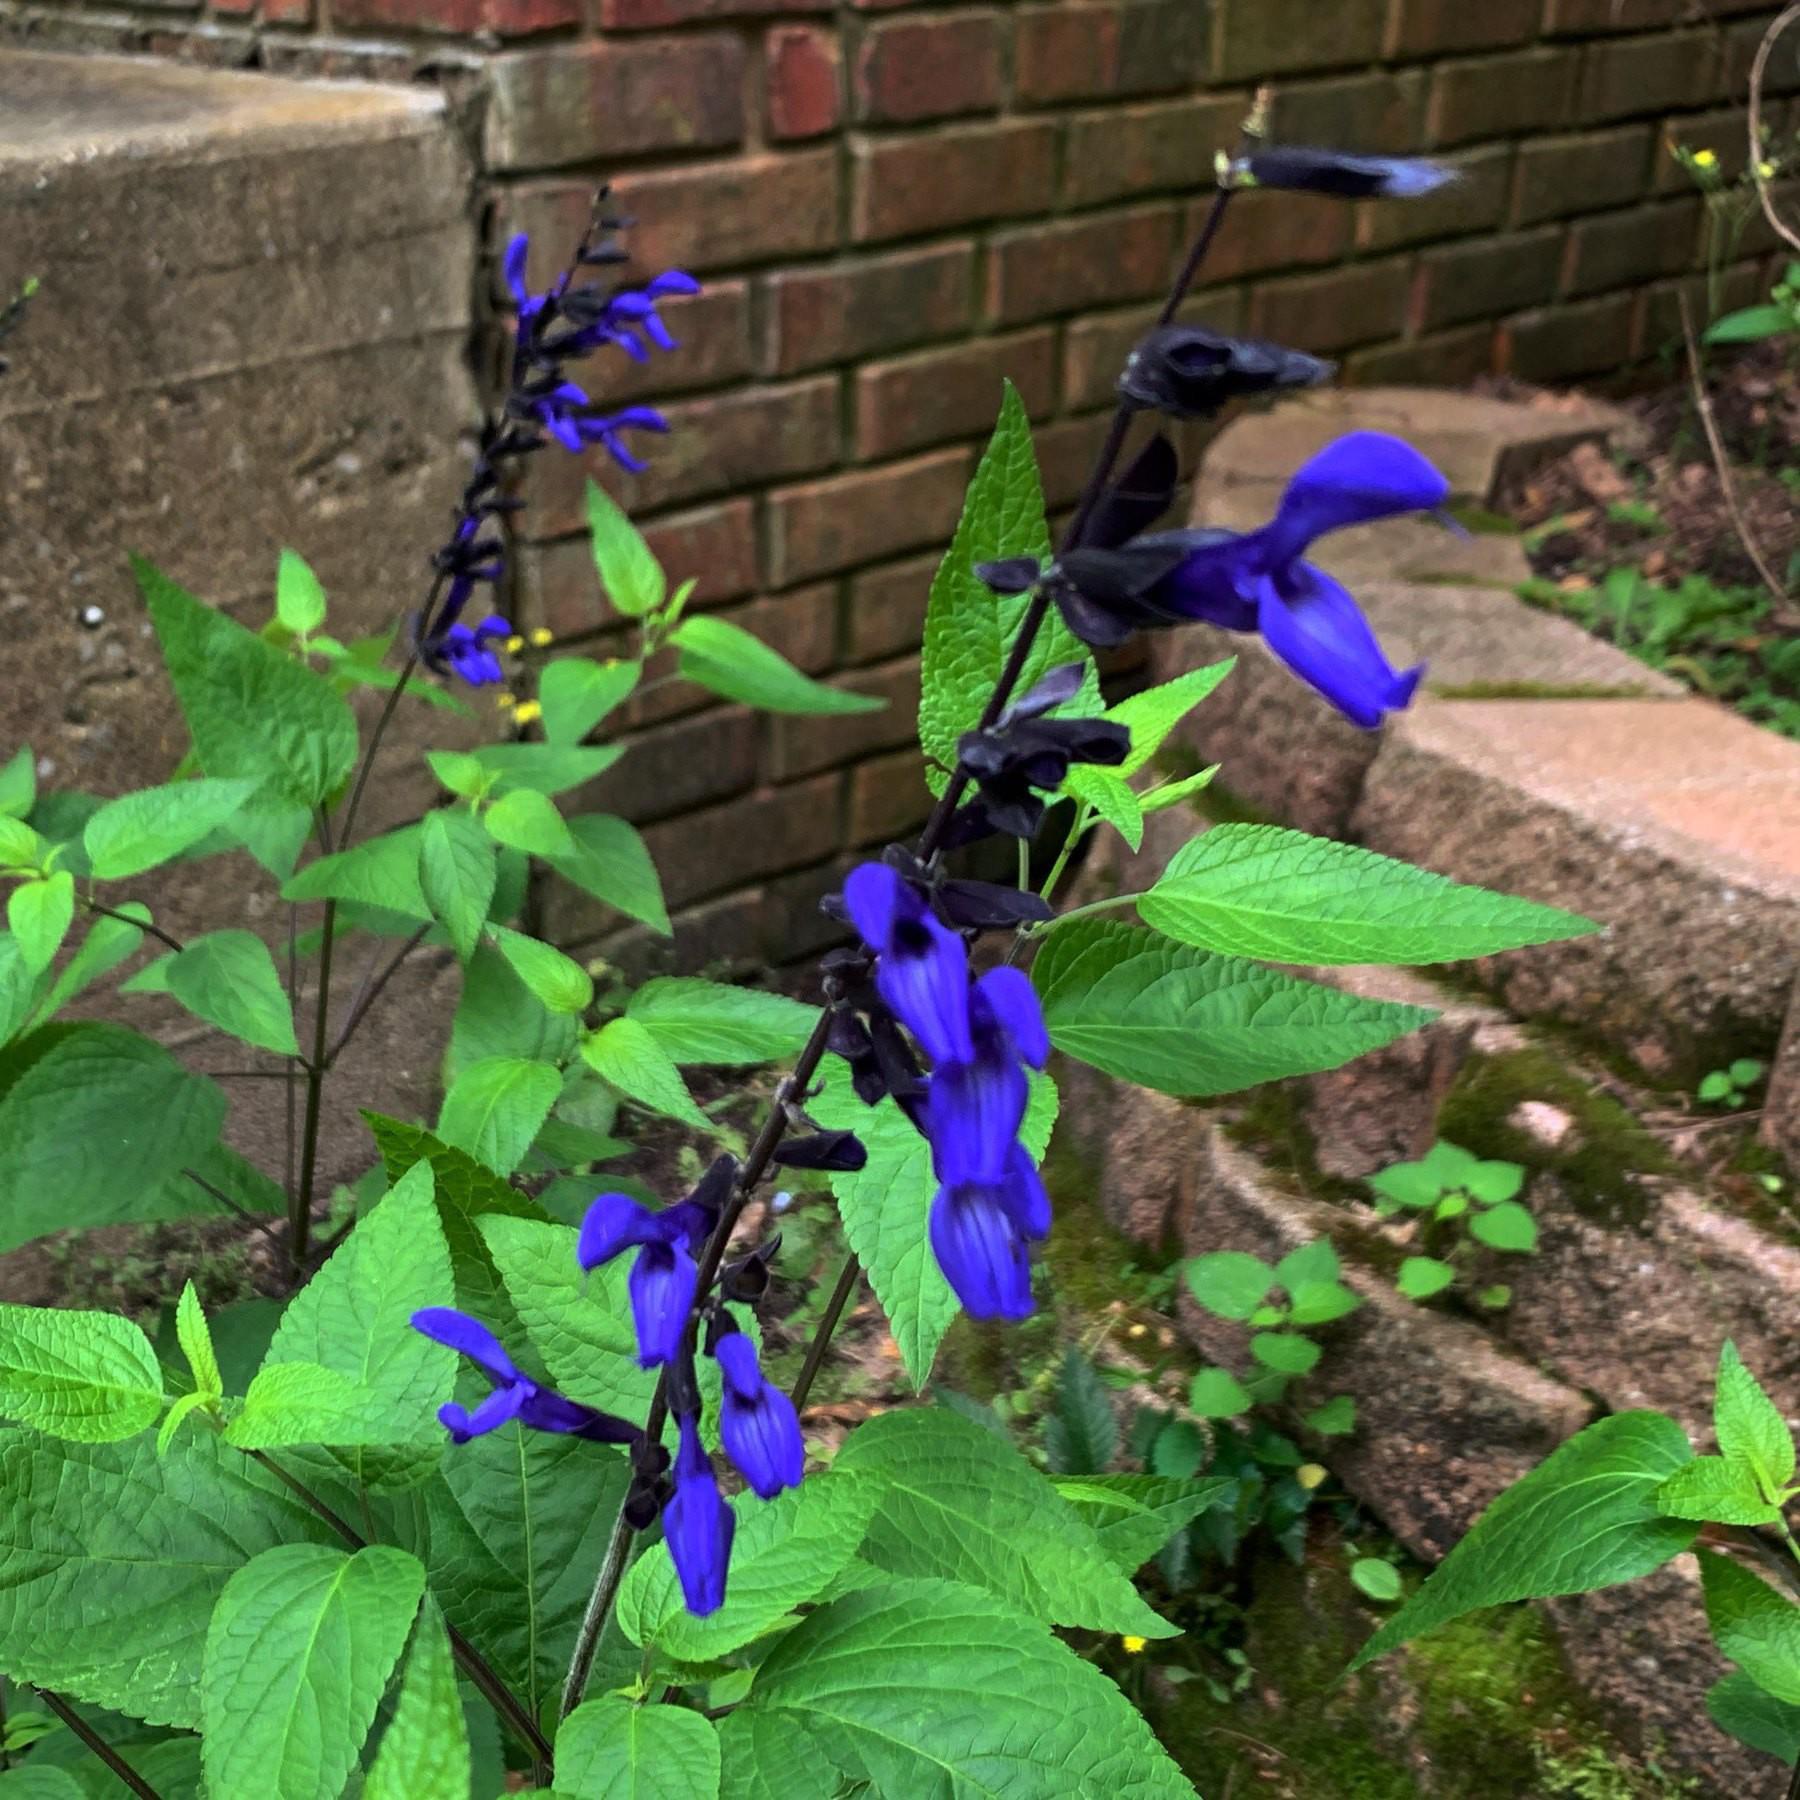 A blooming Black & Blue flower in a garden